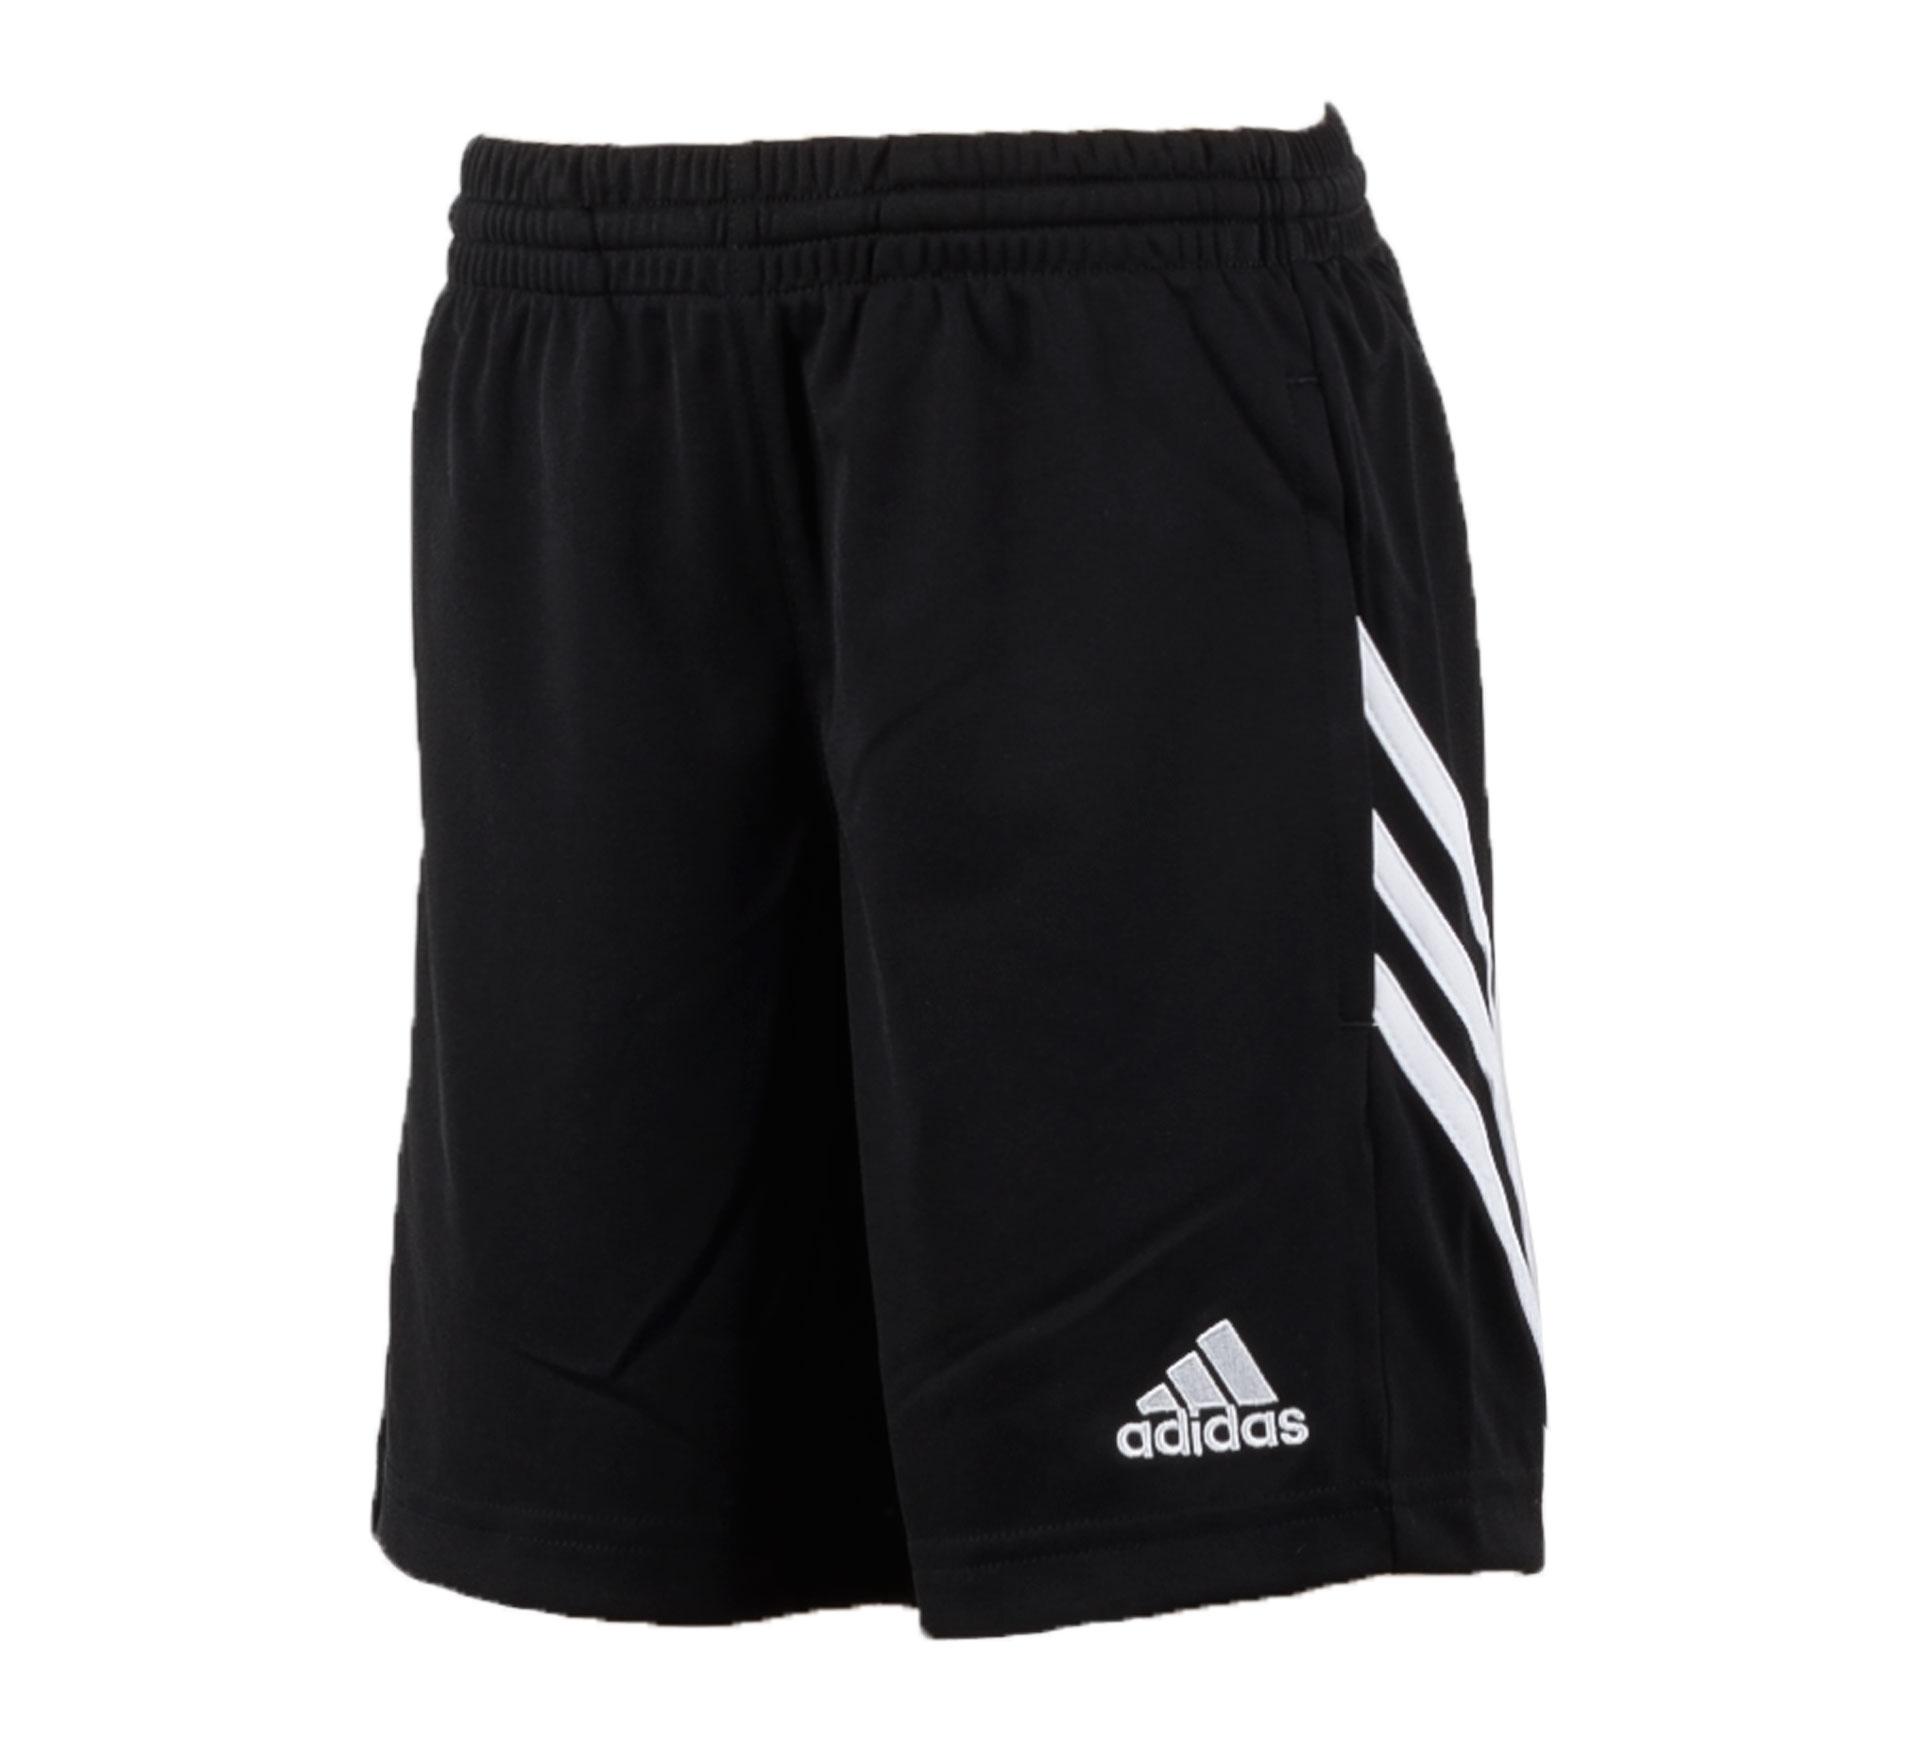 Adidas Sereno 14 Trainingsshort Junior zwart - wit